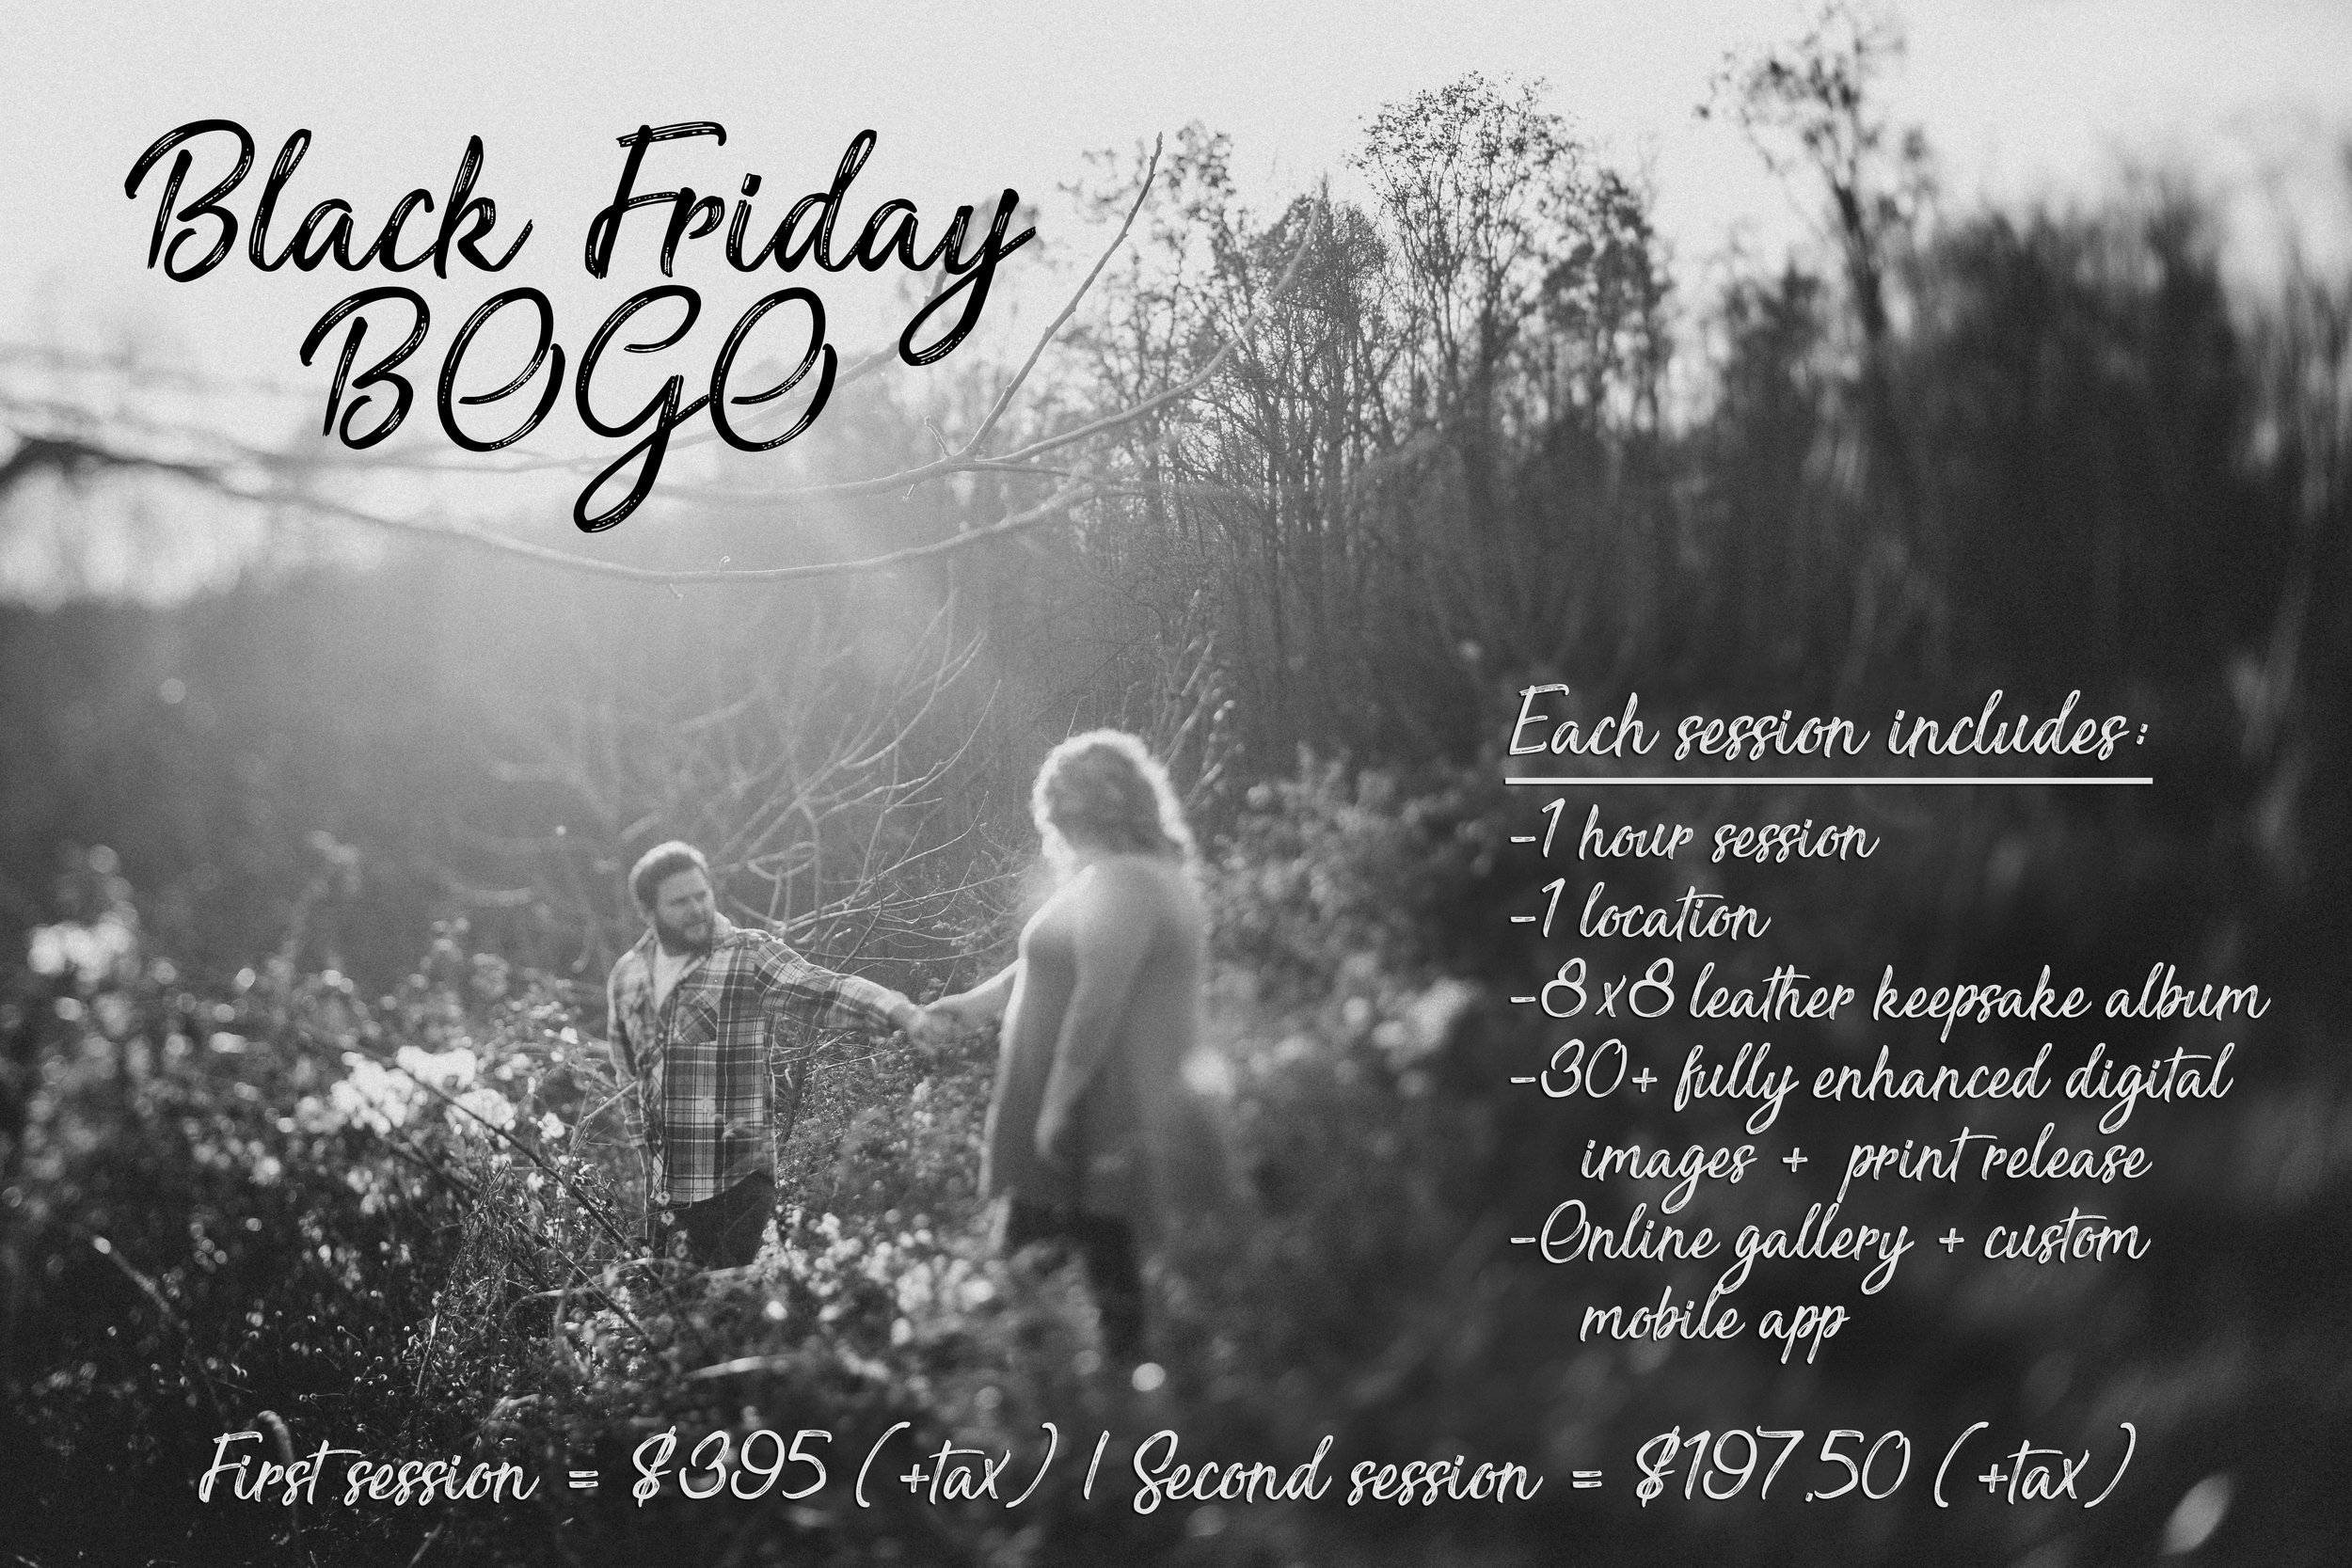 Emily_Rogers_Photographer_Wedding_Family_Photographer_Lebanon_southwest_virginia-bogo-lack-friday-sale.jpg